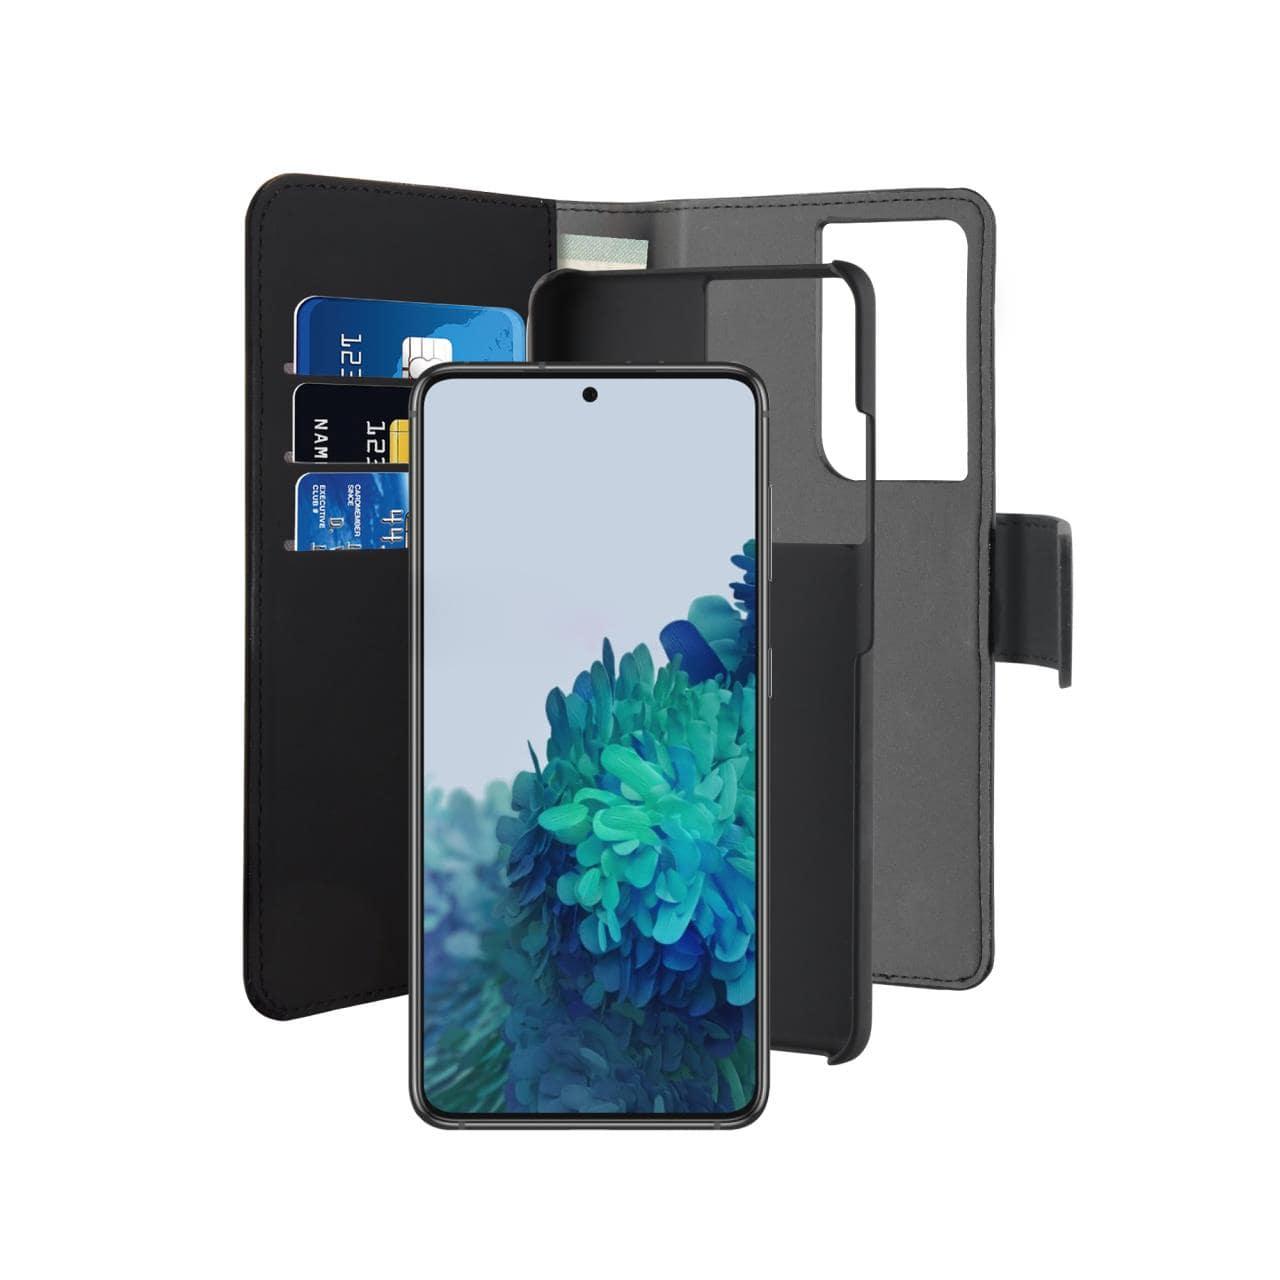 puro-custodia-wallet-detachable-samsung-galaxy-s21-ultra_01-min